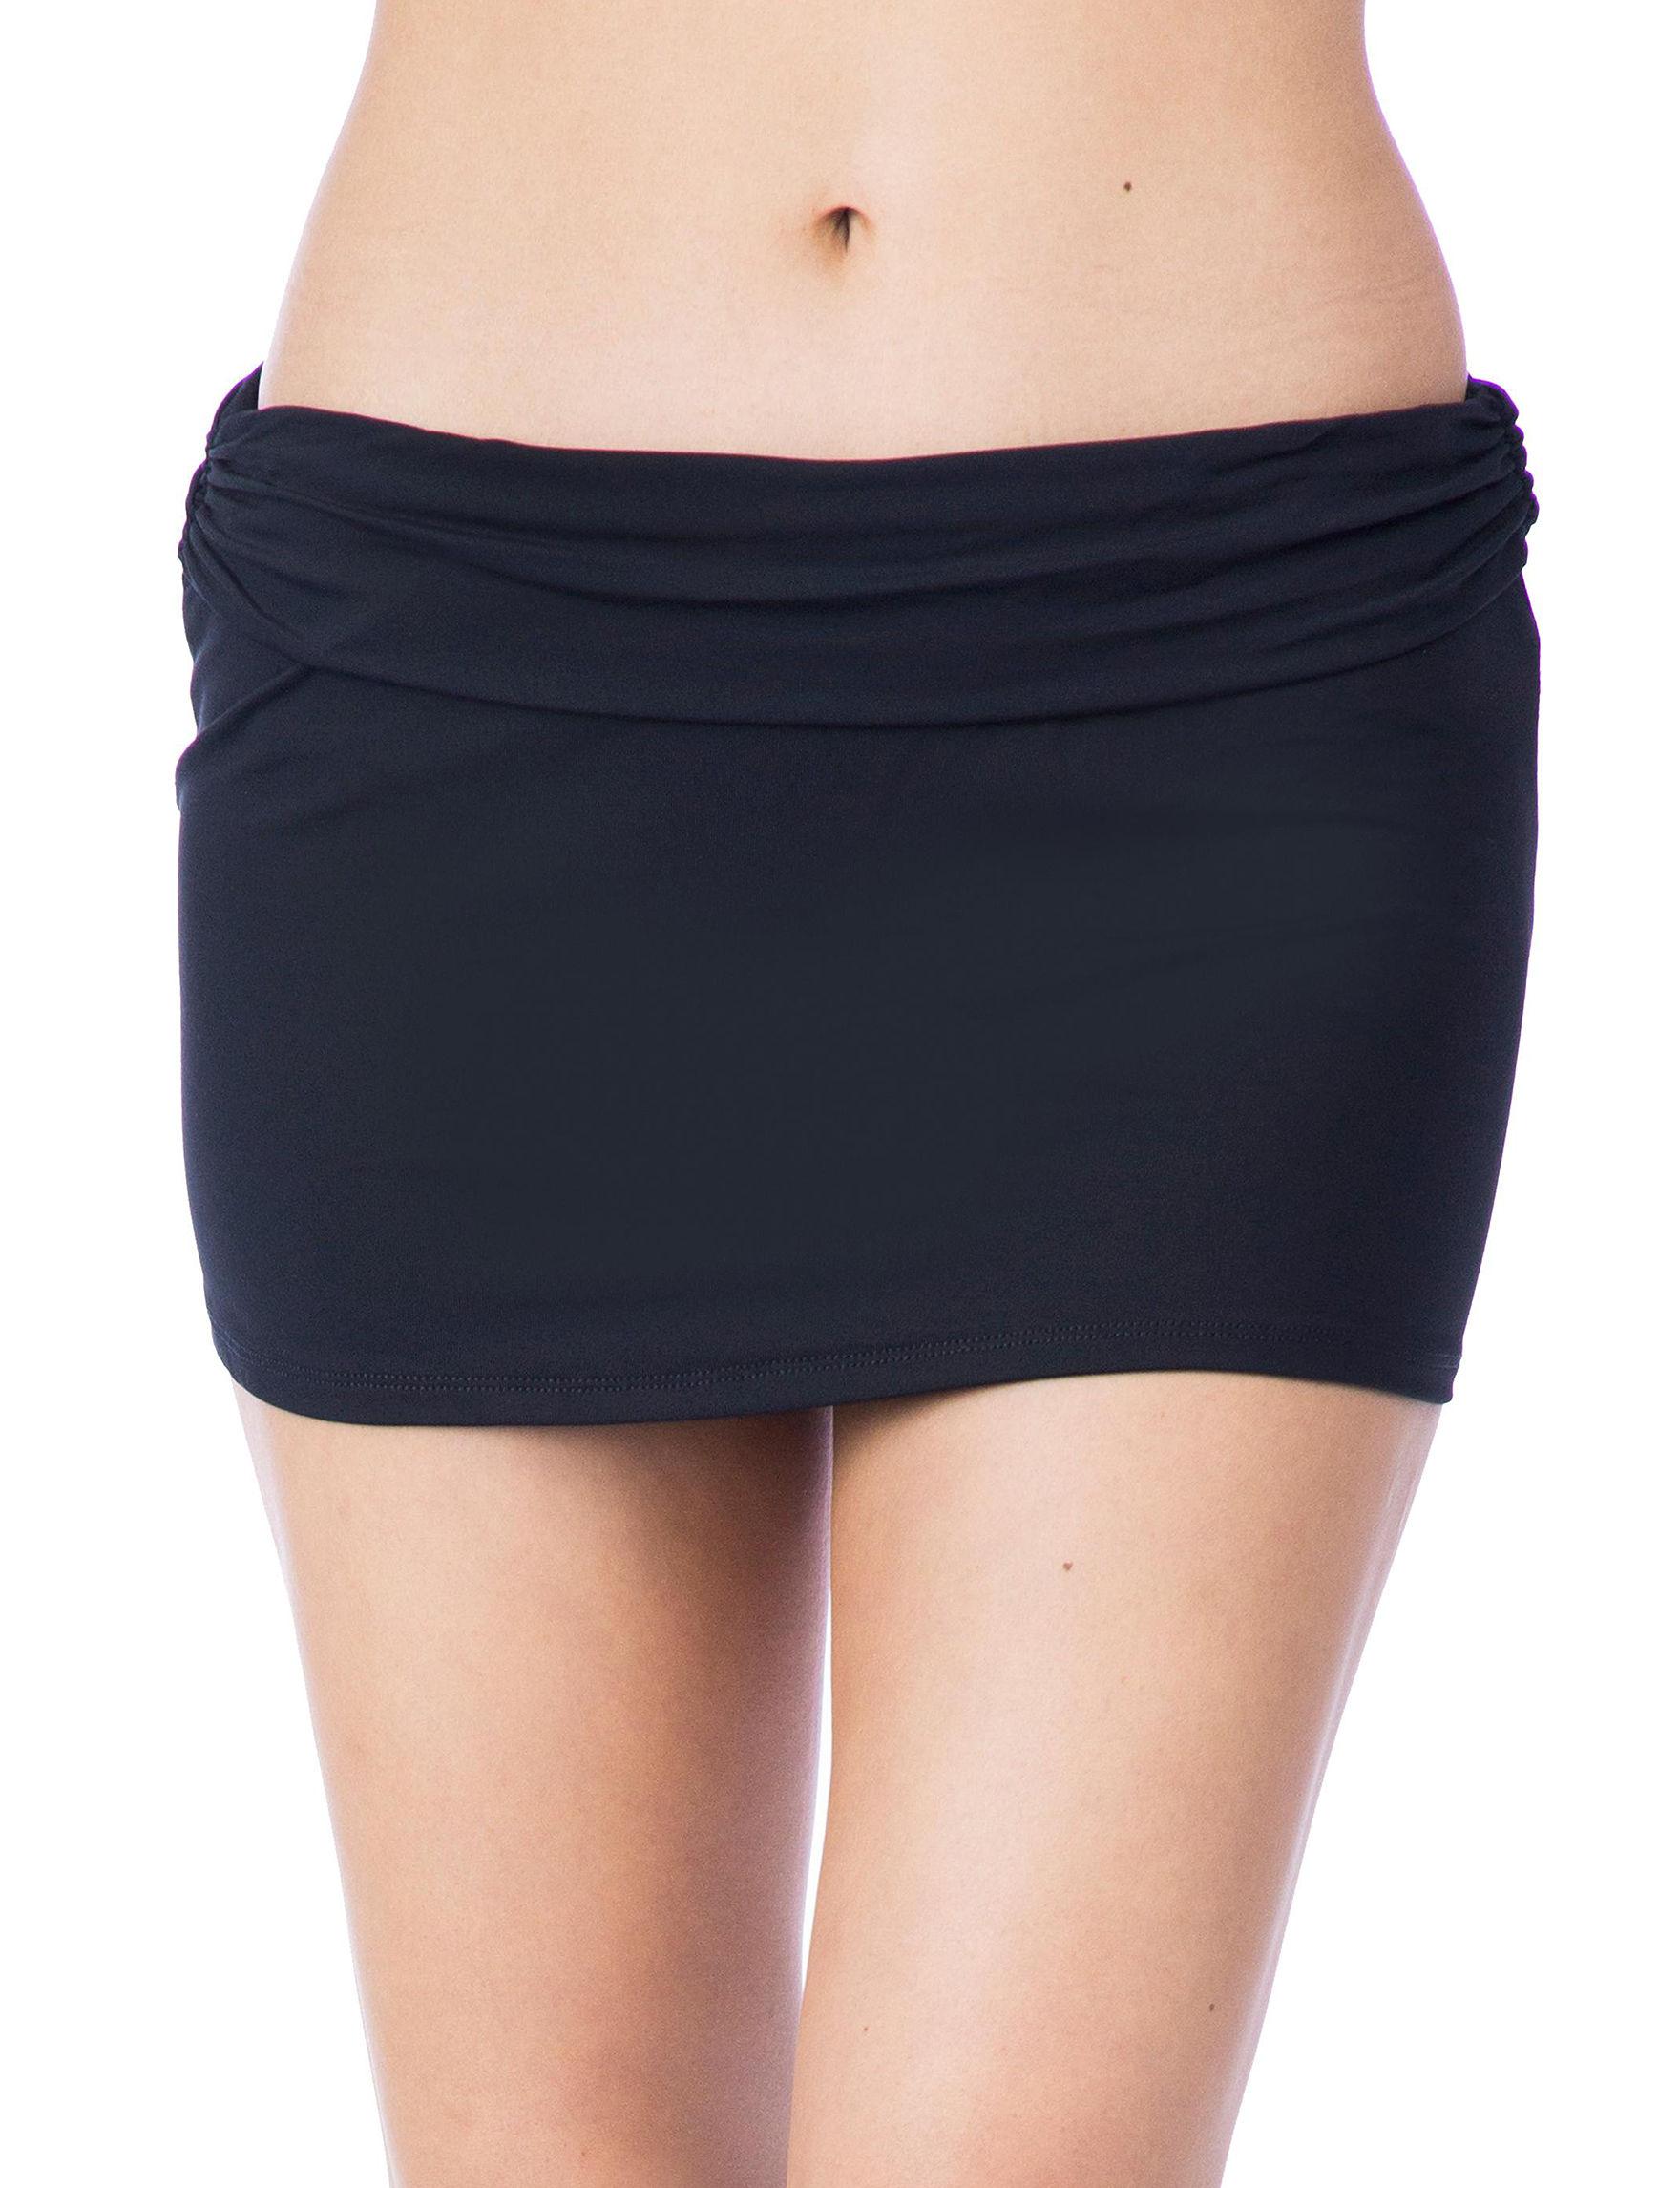 Chaps Black Swimsuit Bottoms Skirtini